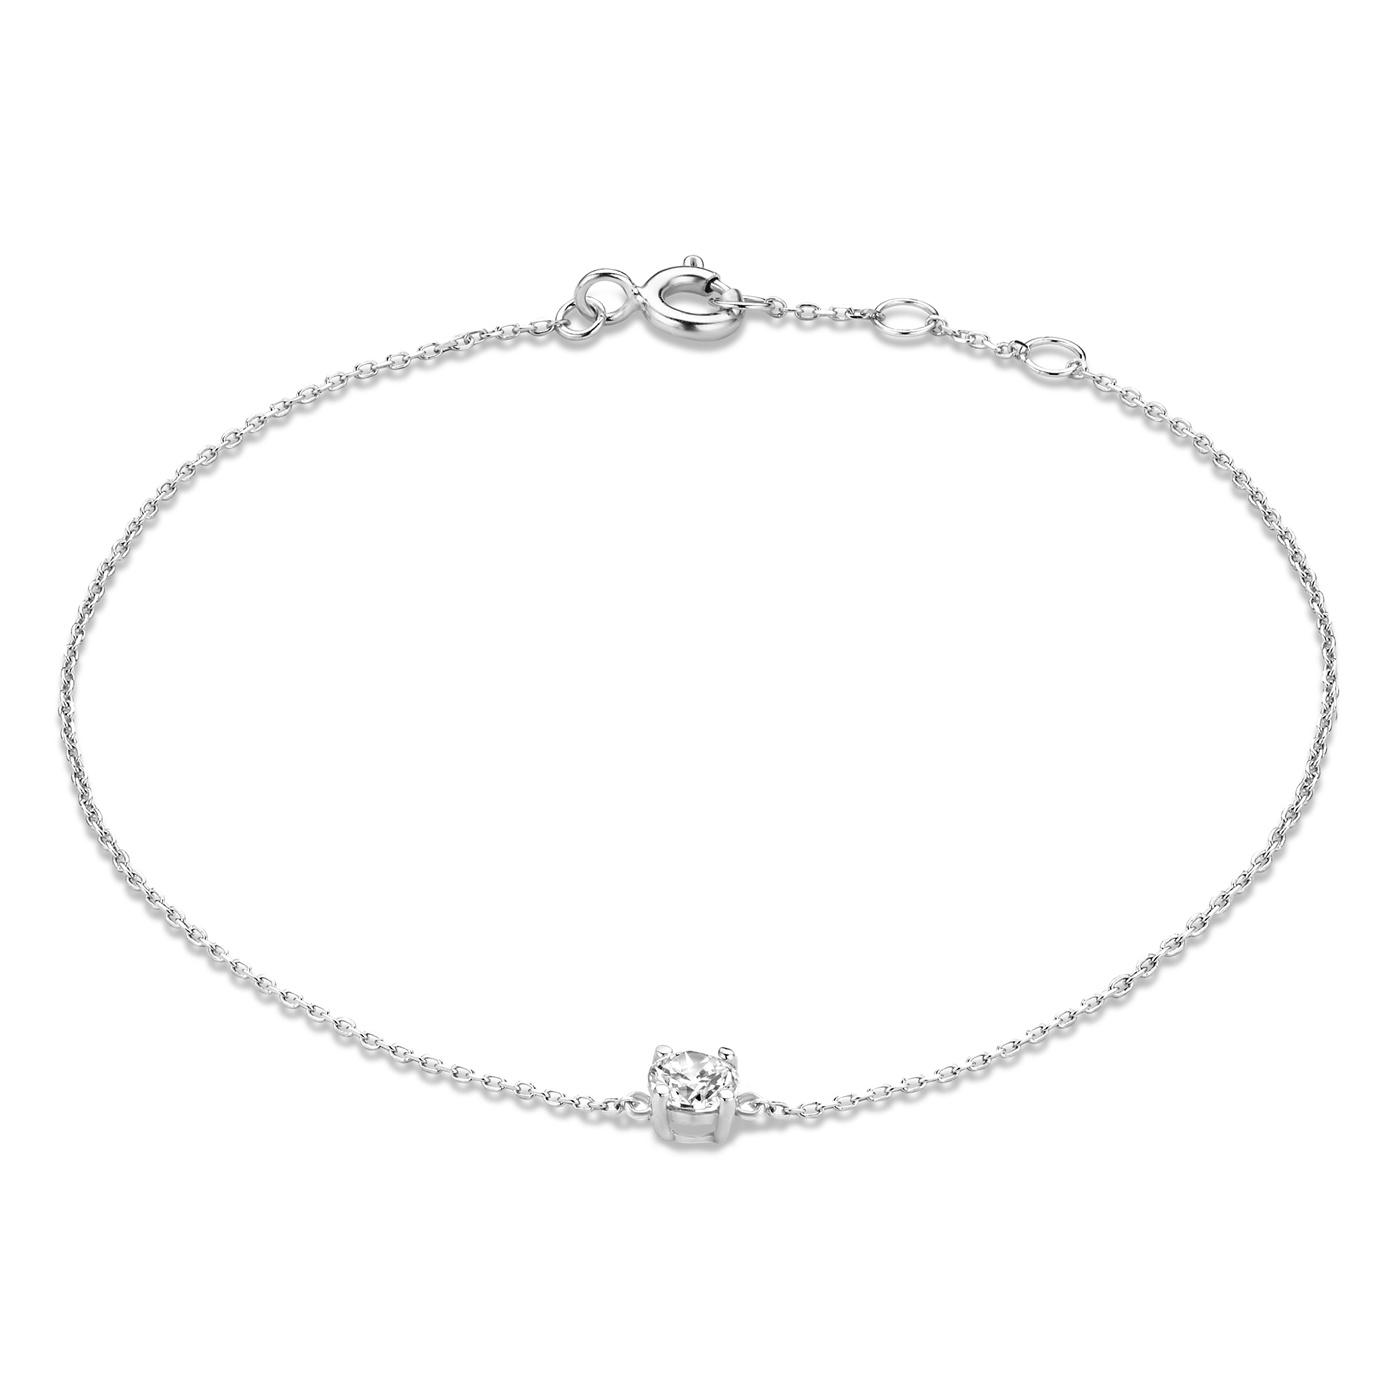 Isabel Bernard Saint Germain Faïs 14 carat white gold bracelet zirconia